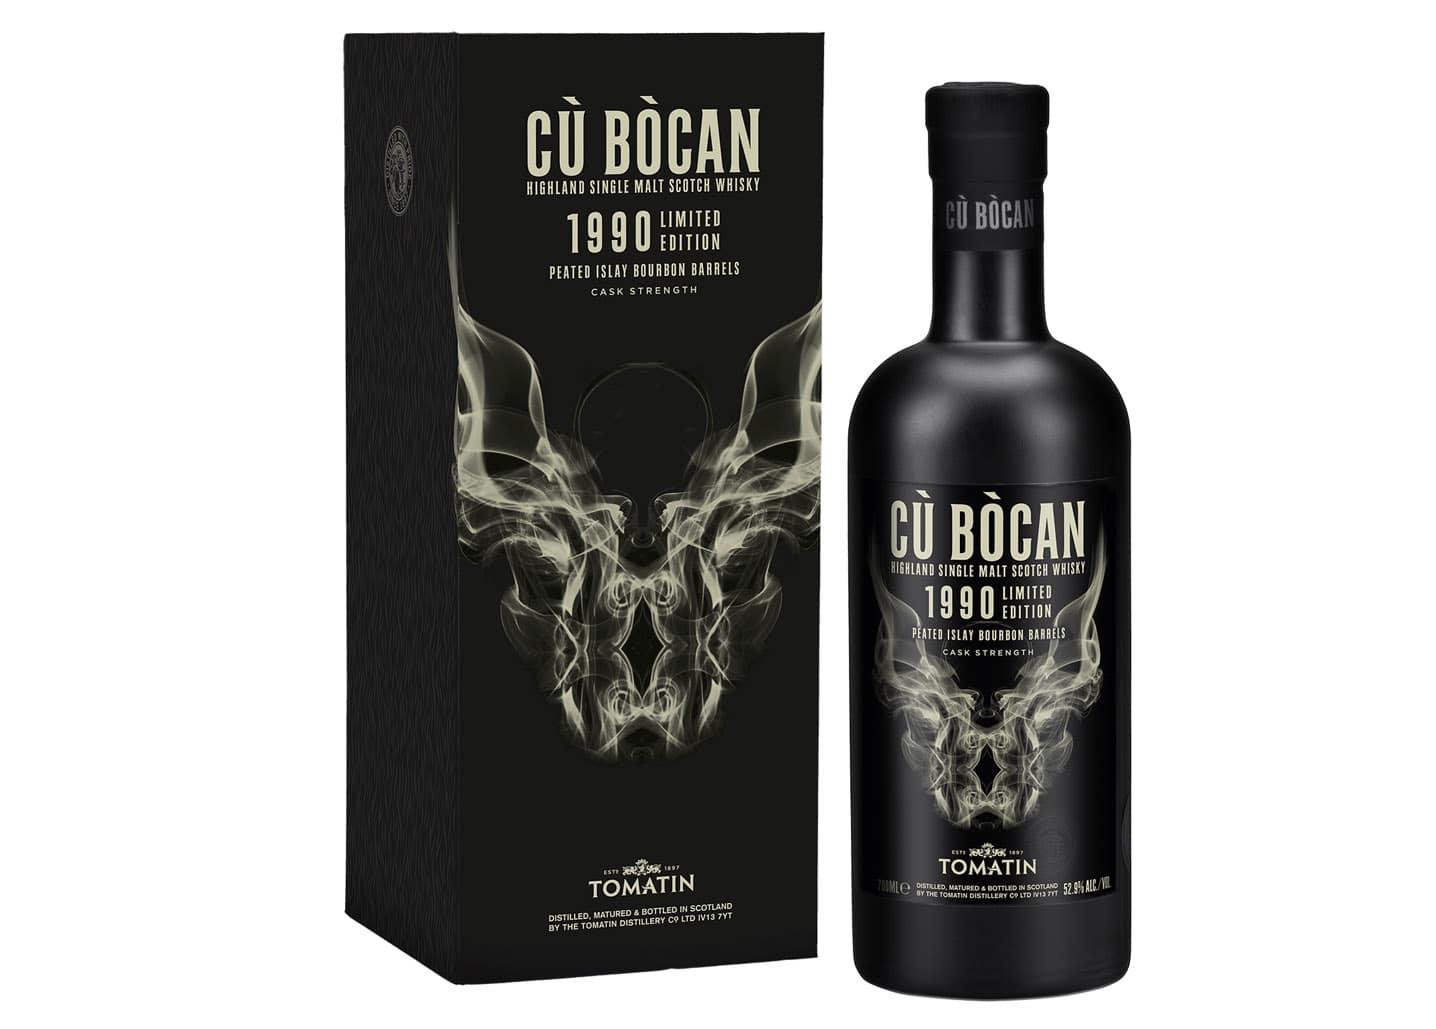 Cù Bòcan Vintage 2003 1990 - Todo Whisky